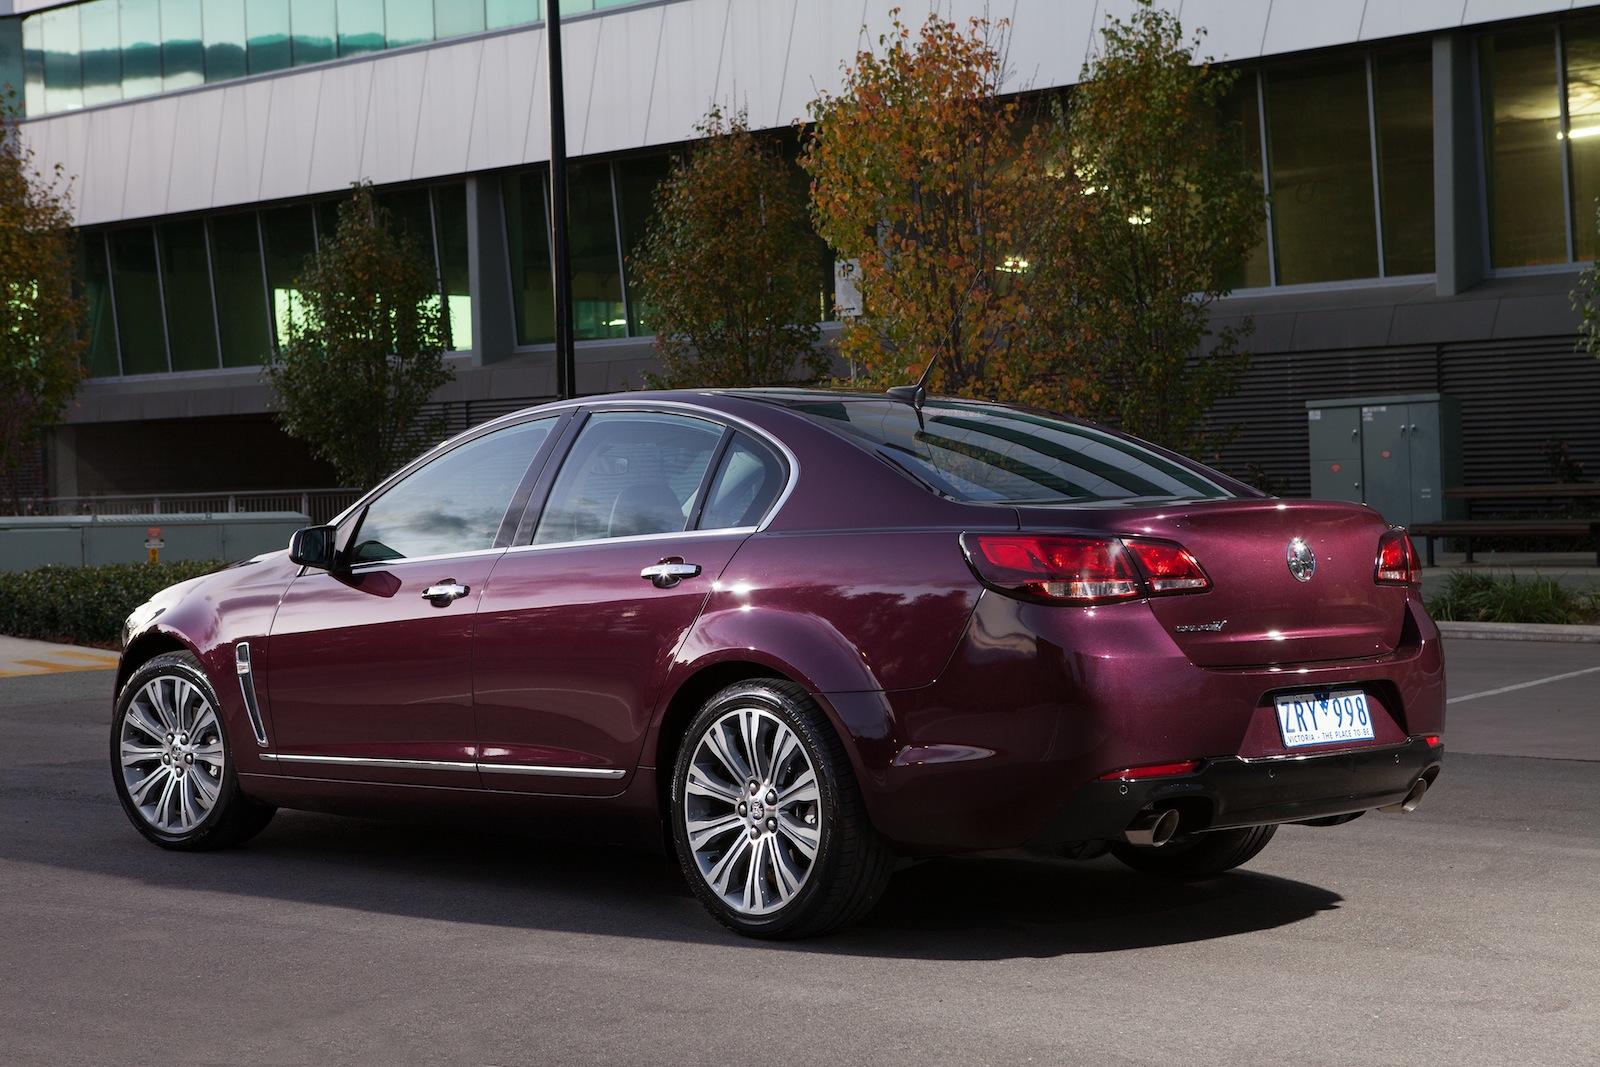 Compare Car Specs >> 2013 Holden VF Calais Review - photos | CarAdvice